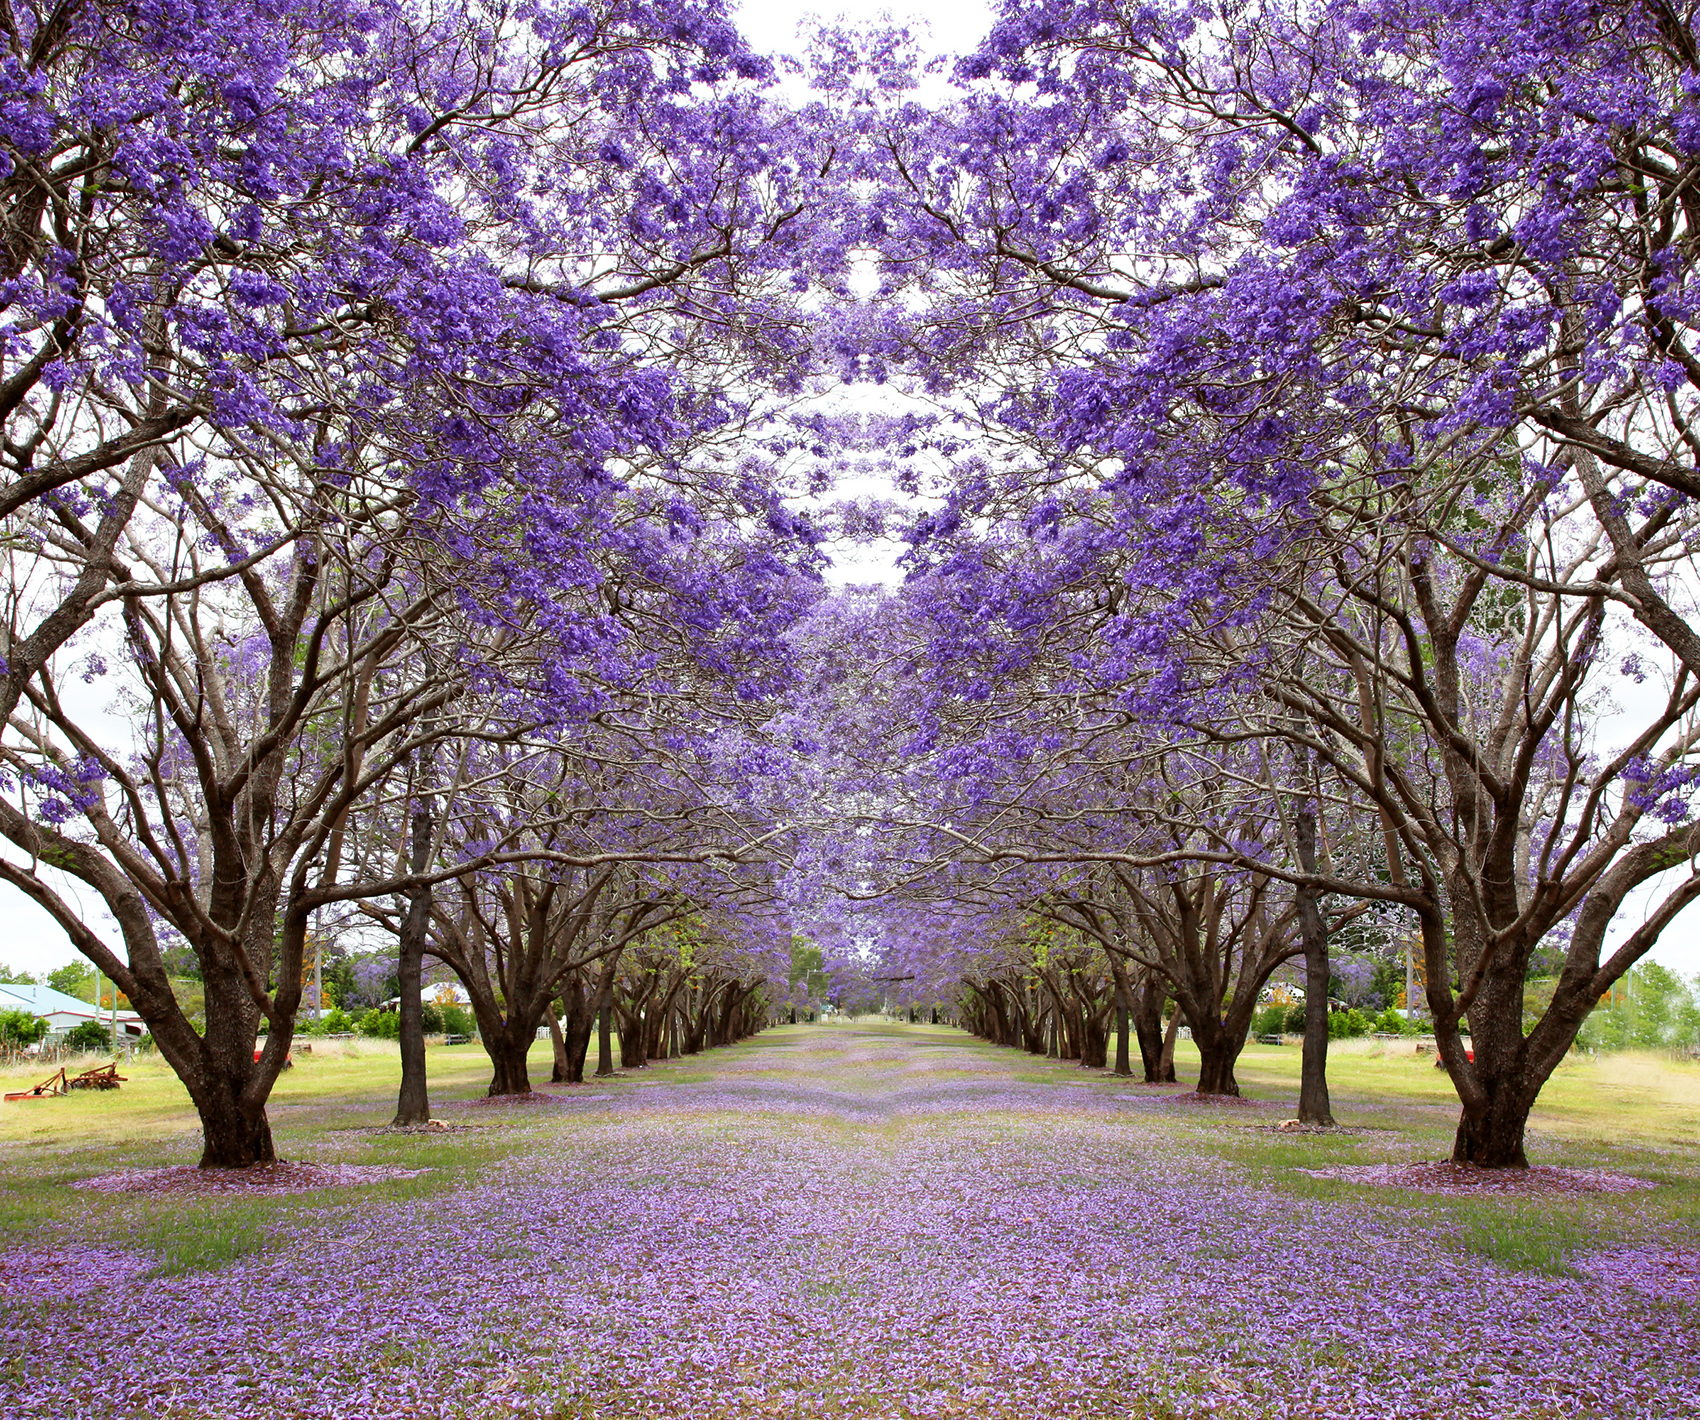 Beautiful Jacaranda trees in New Farm Park, Queensland, Australia